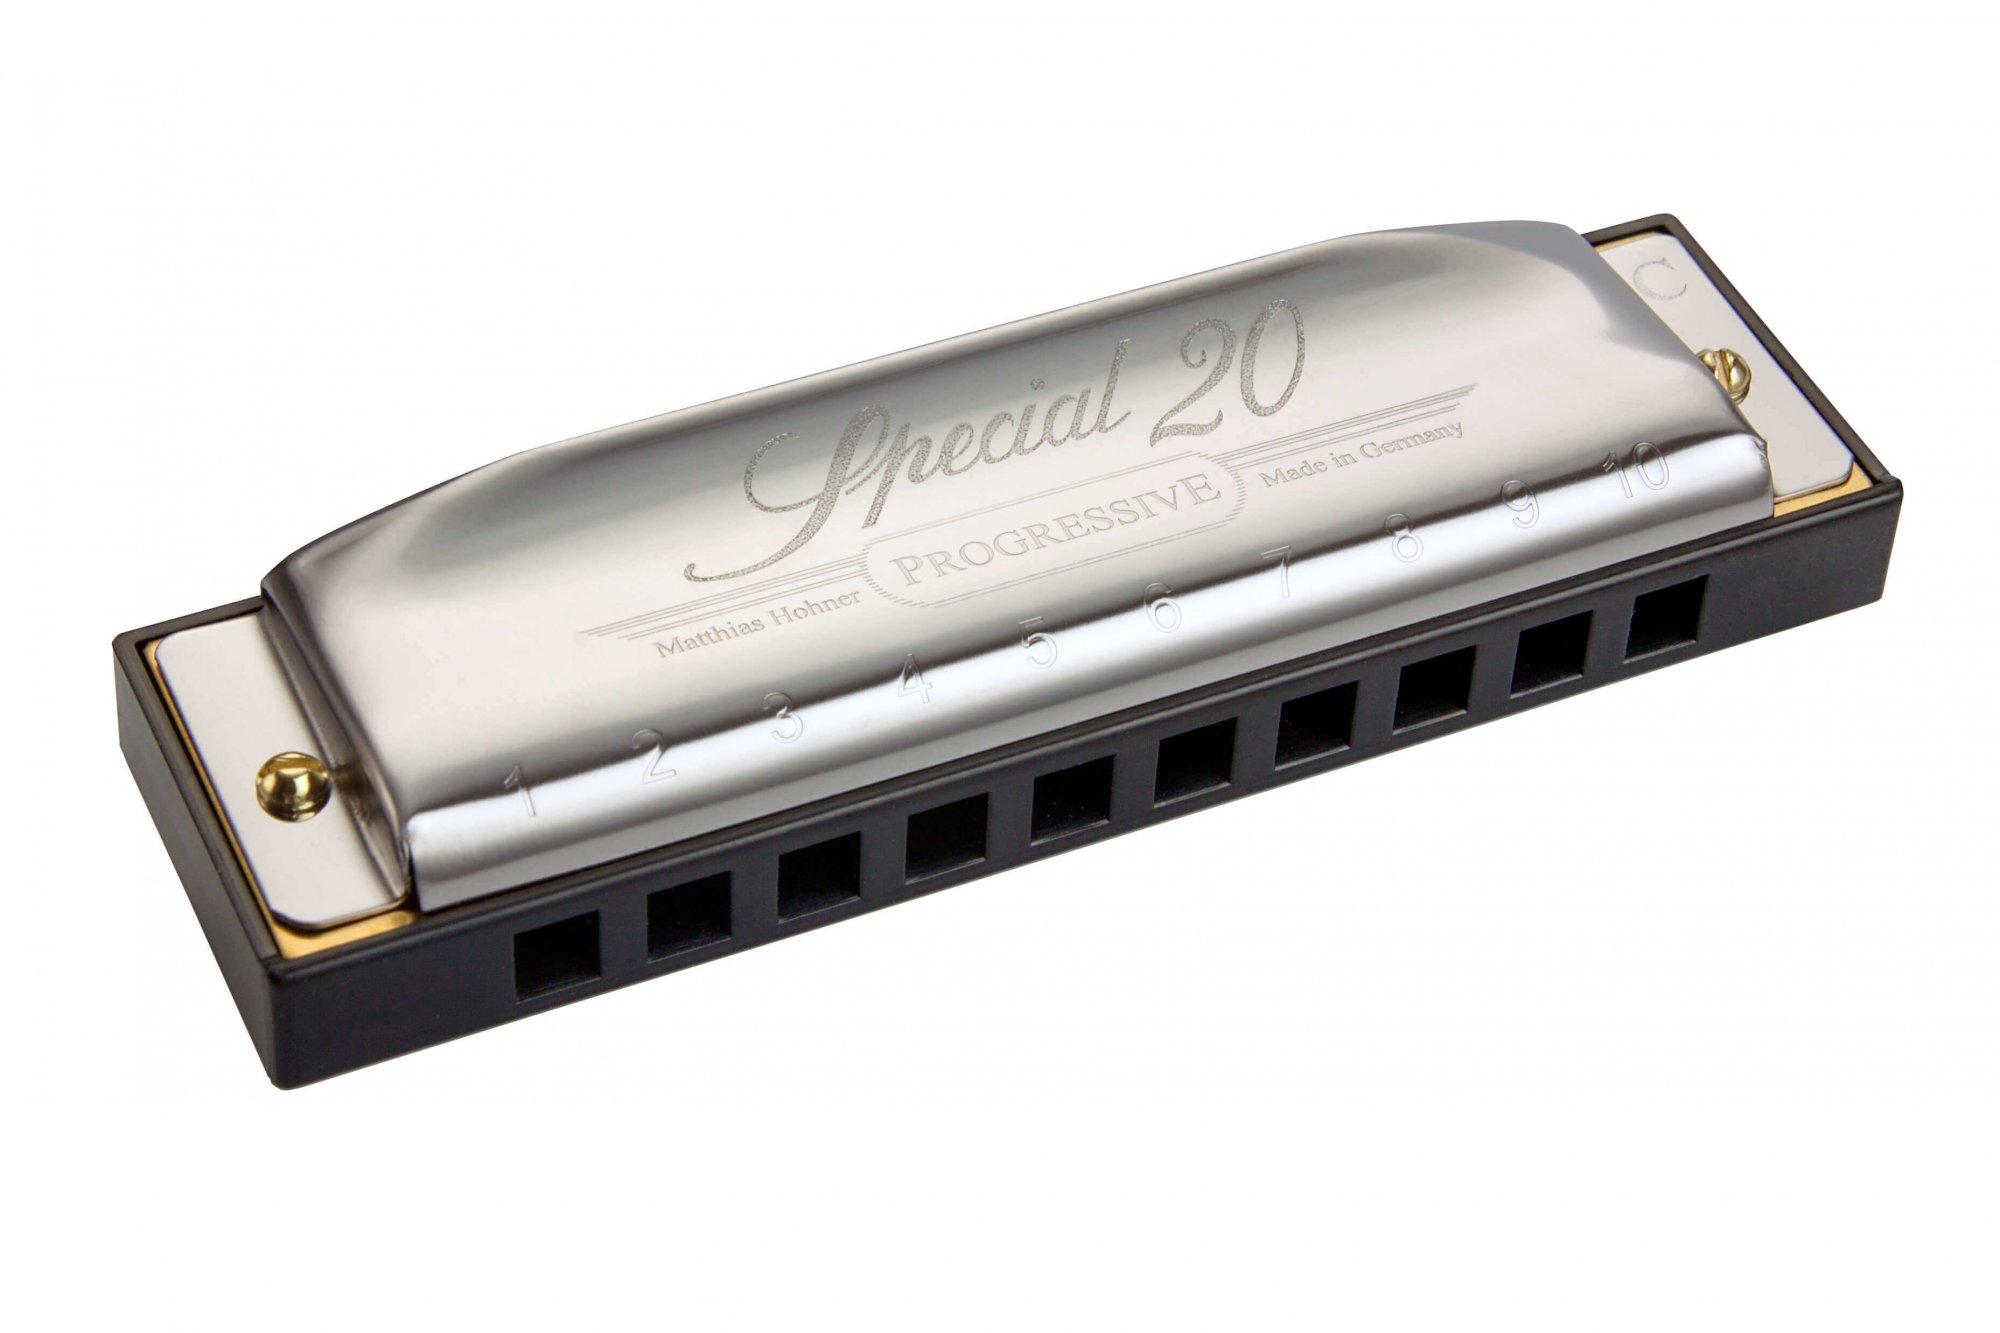 Hohner Progressive Series Special 20 Harmonica - model 560